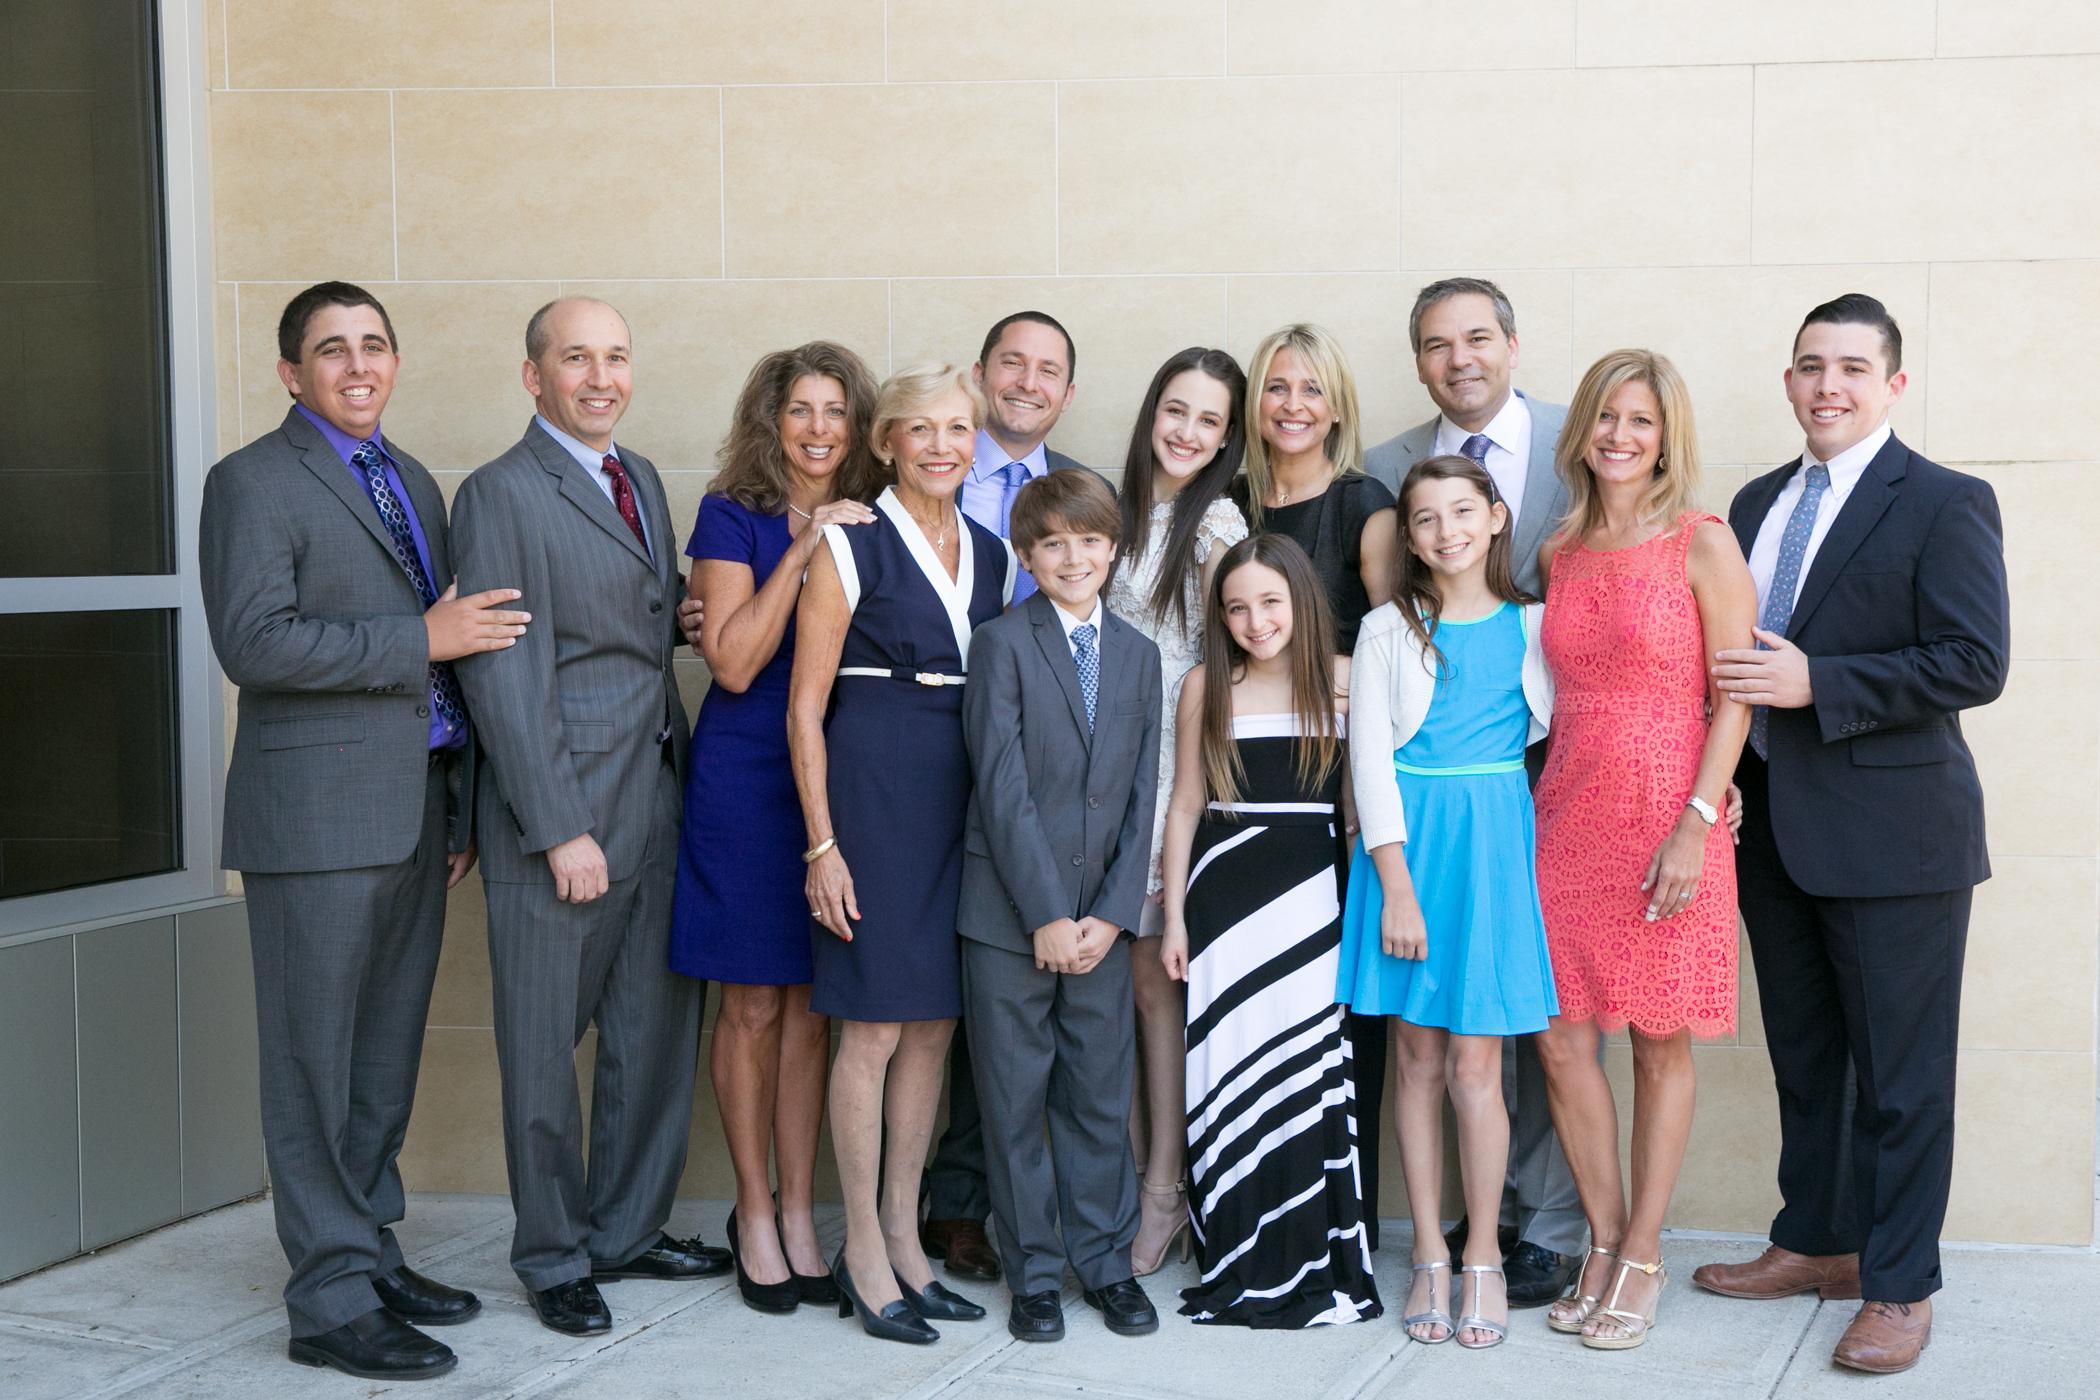 The Family at Jessie's Bat Mitzvah